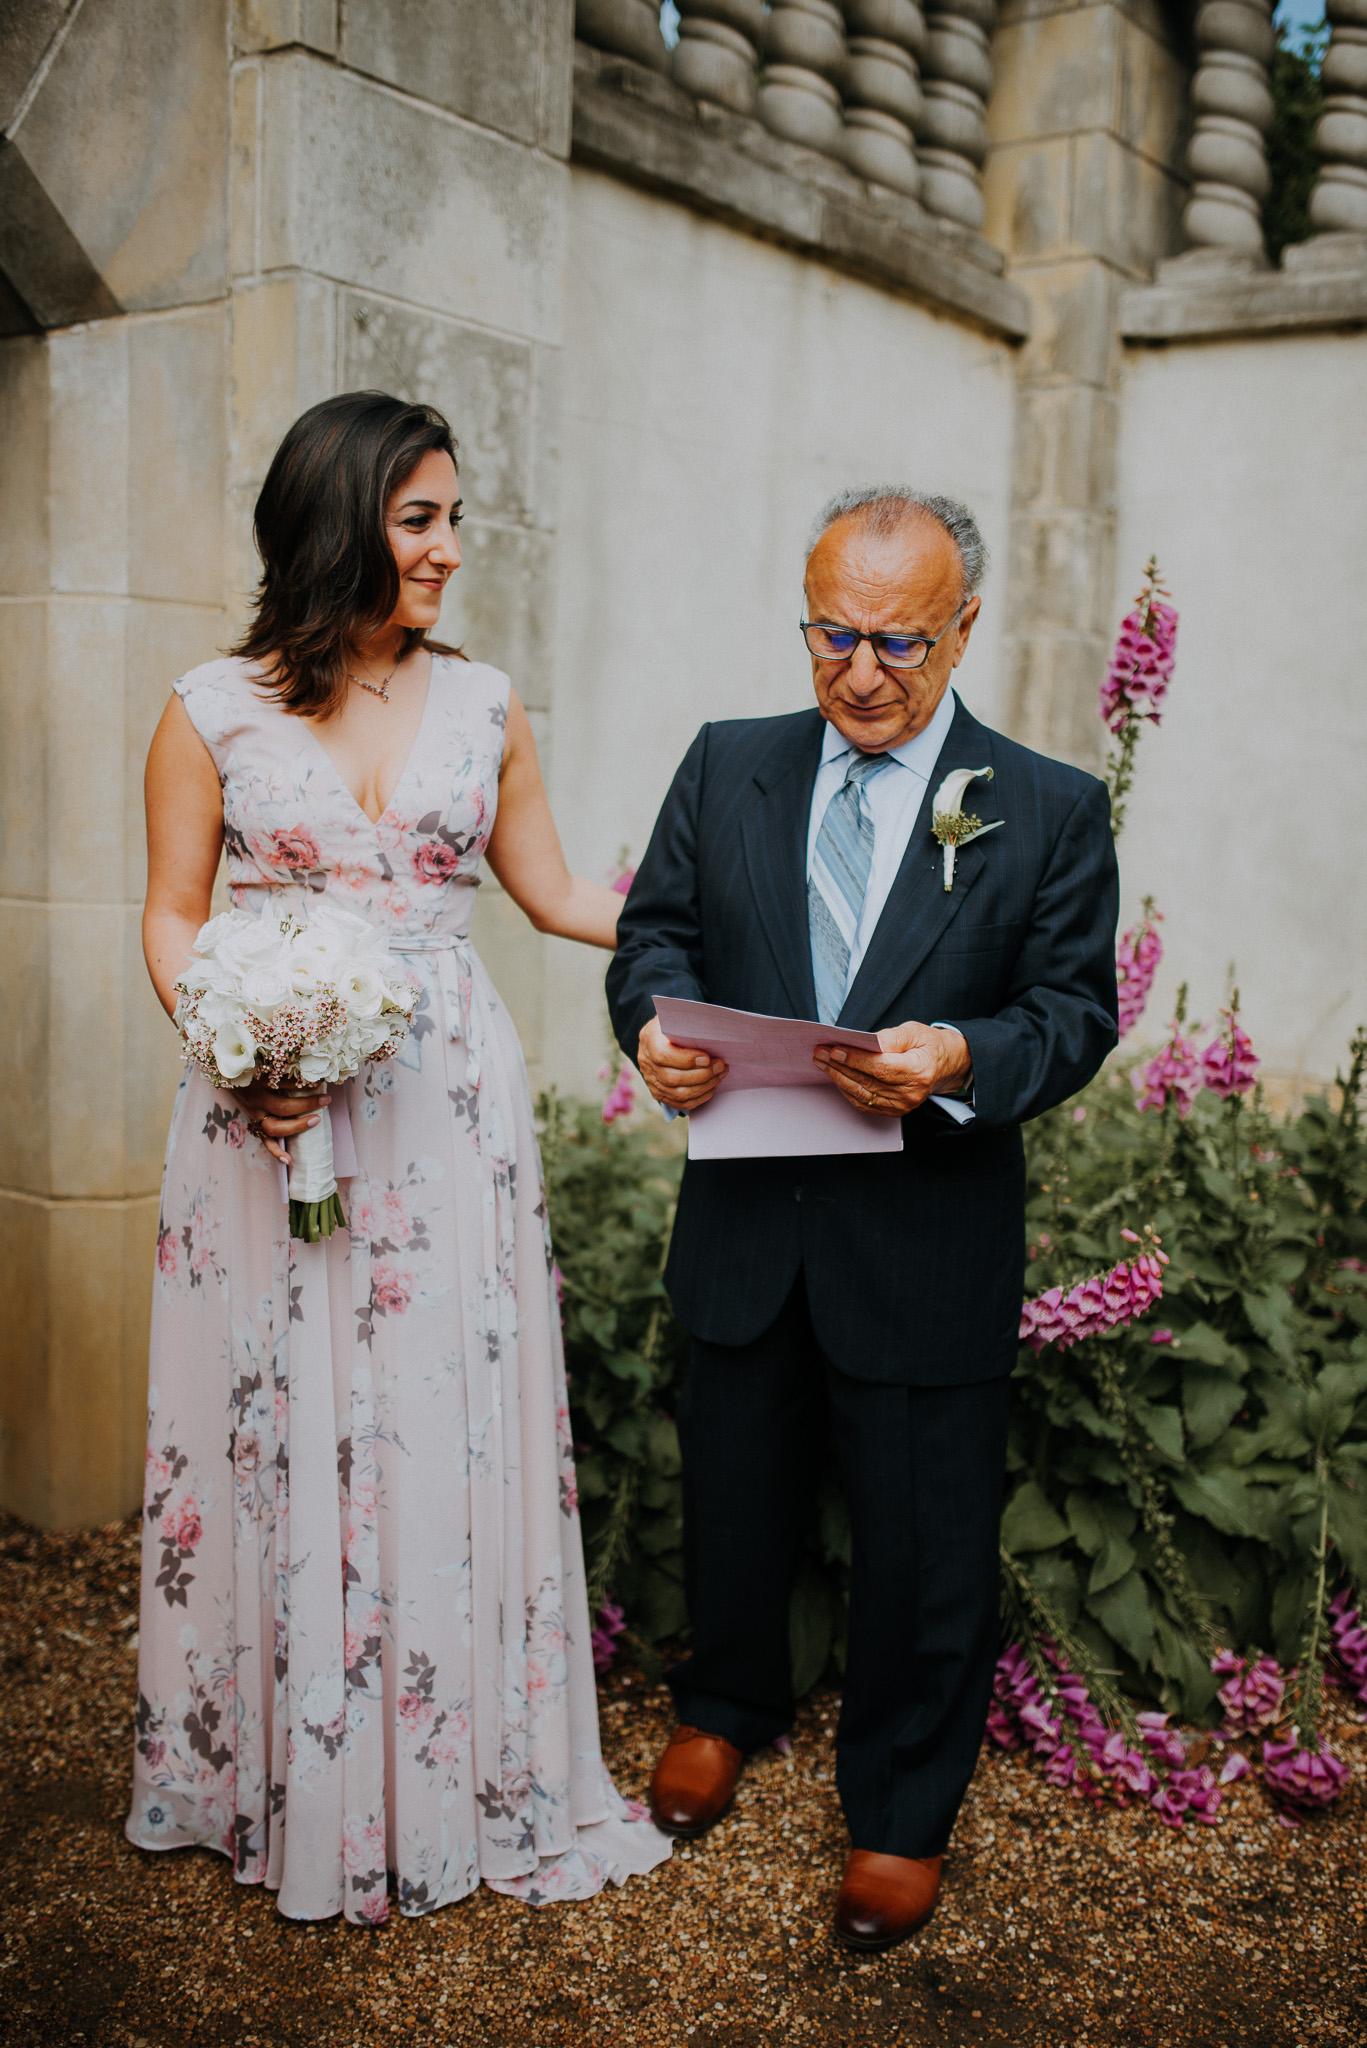 Dallas-fort-worth-wedding-photographer-dallas-arboretum-intimate-wedding-dallas-texas-12